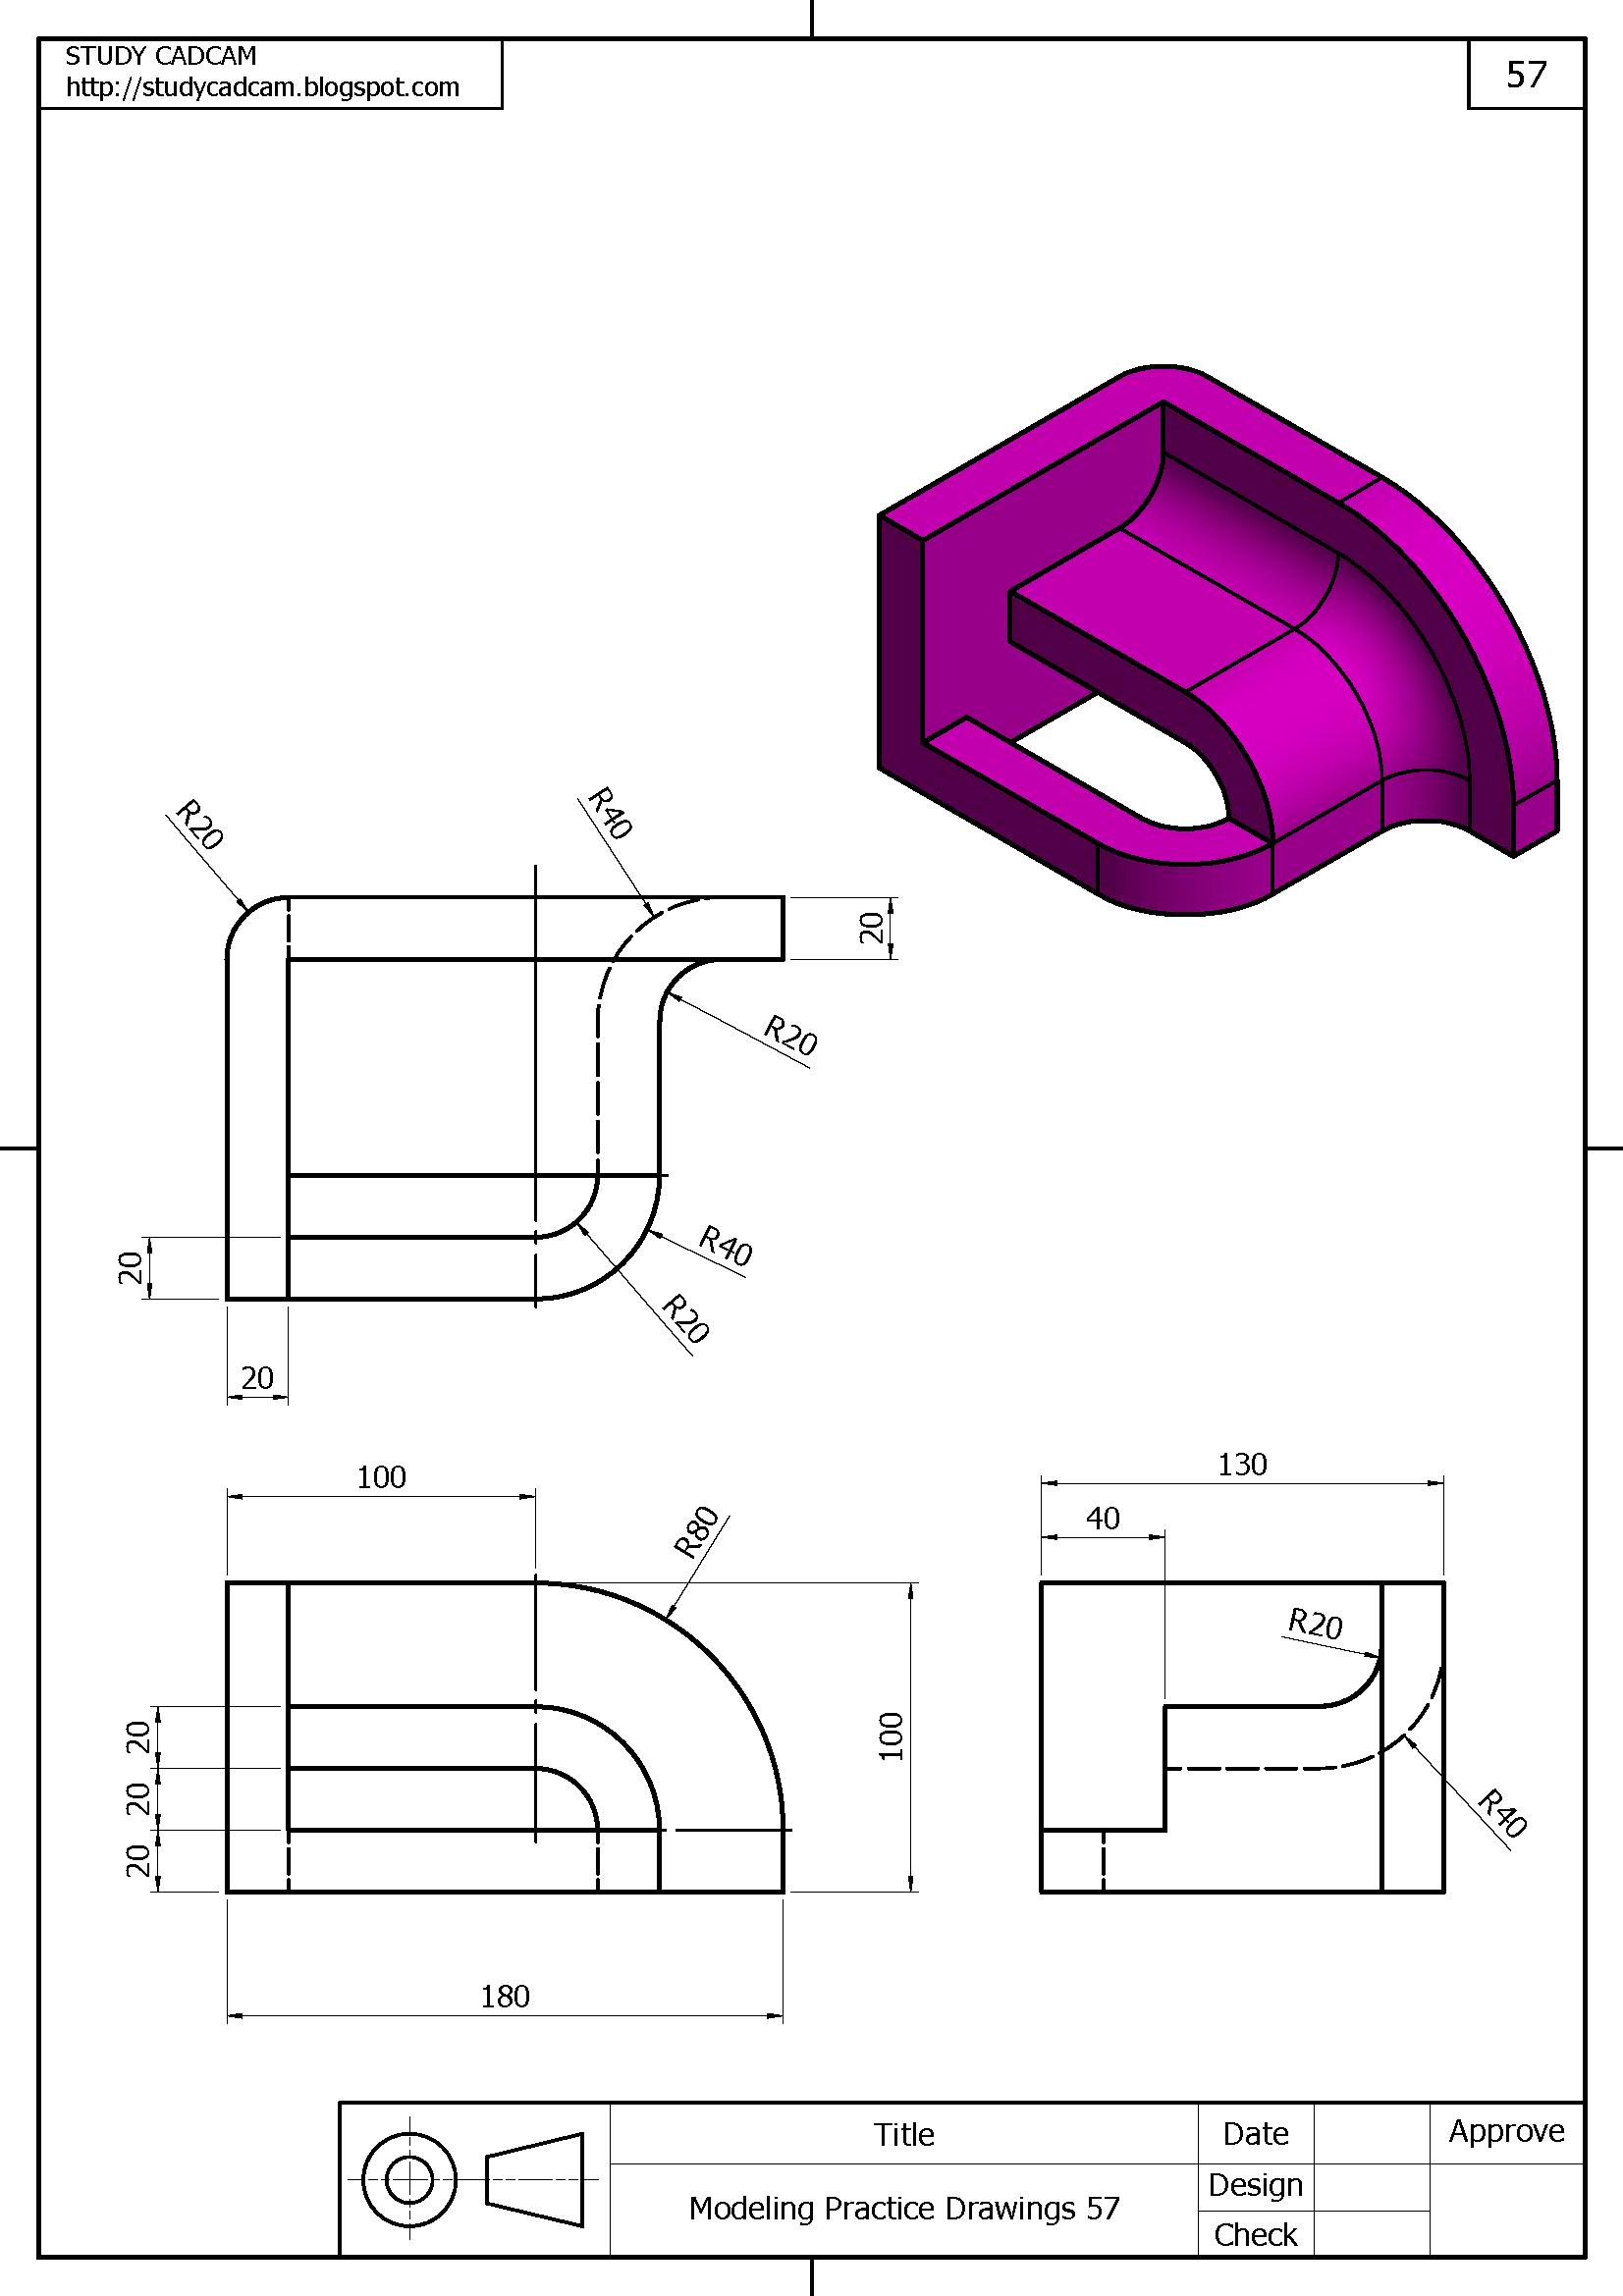 Solidworks Practice Parts : solidworks, practice, parts, Extreme, Solidworks, Ideas, Solidworks,, Tutorial,, Mechanical, Engineering, Design